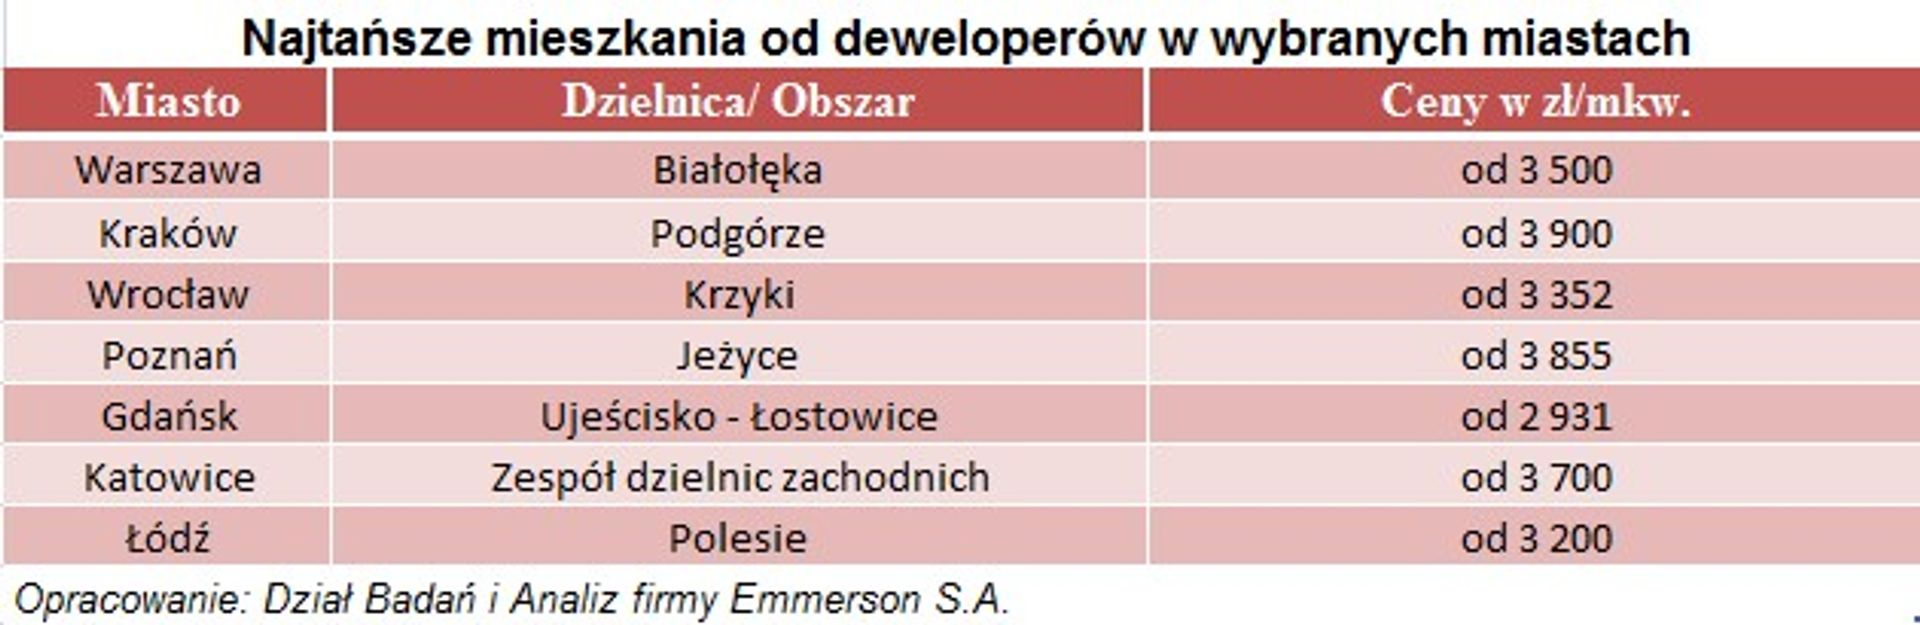 [Polska] Gdzie po najtańsze mieszkania?